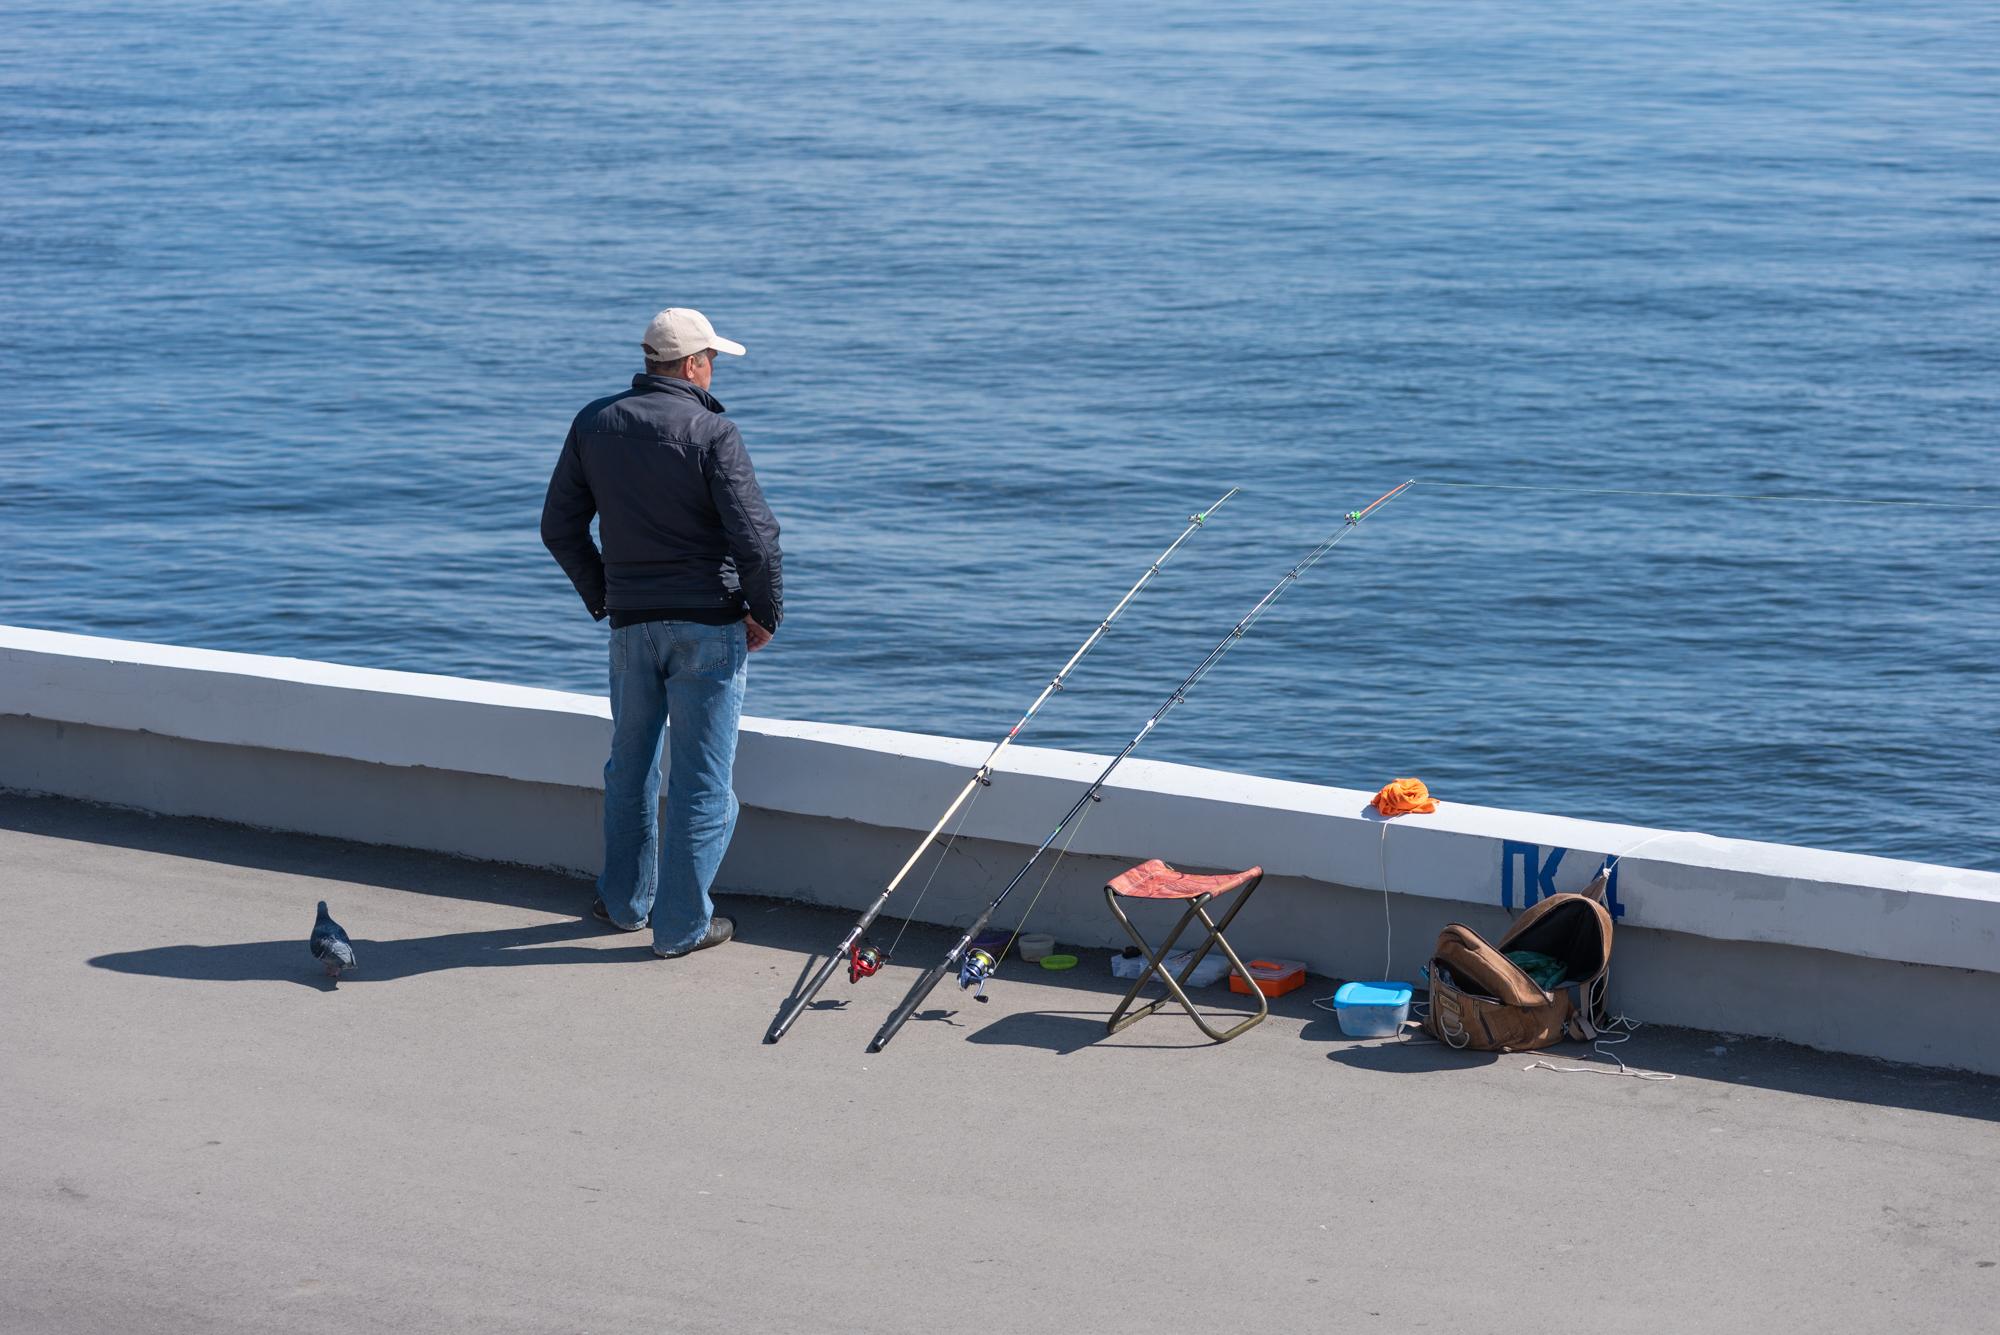 рыбак на набережной